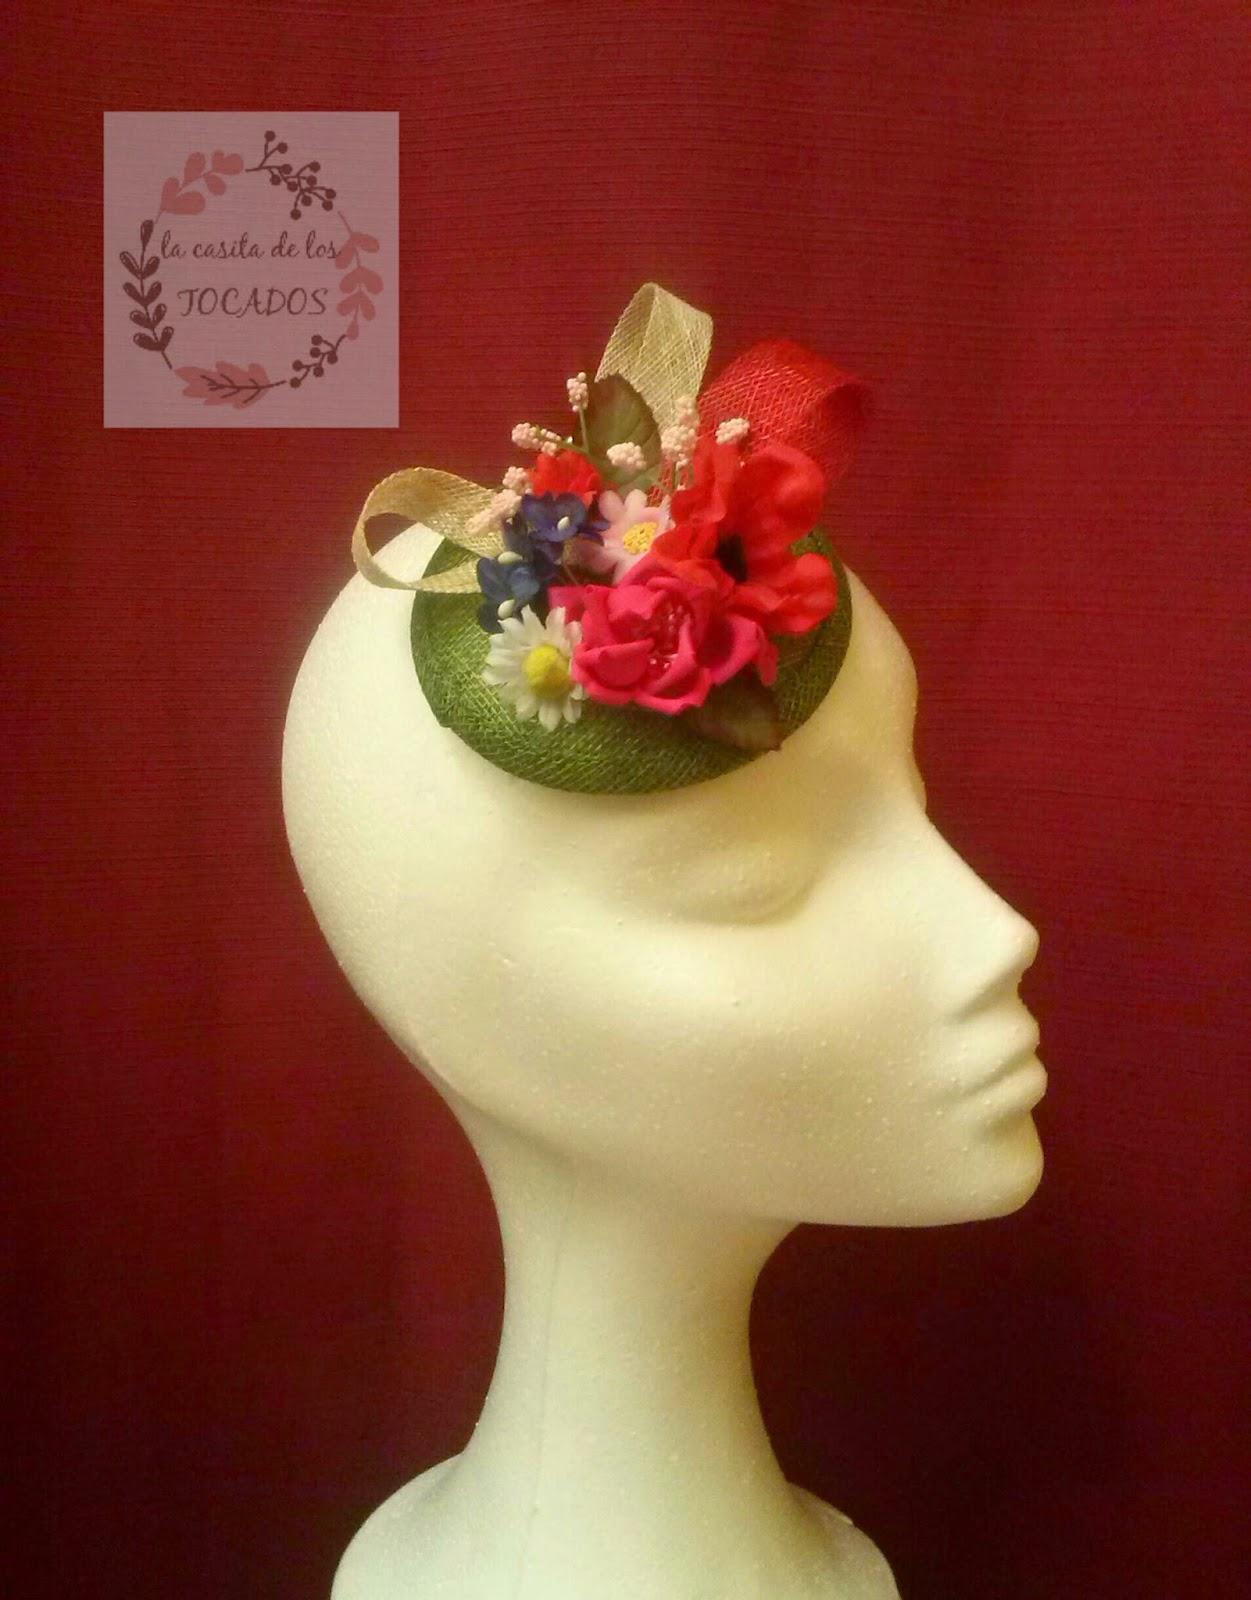 tocado con flores de colores variados de tamaño pequeño para boda